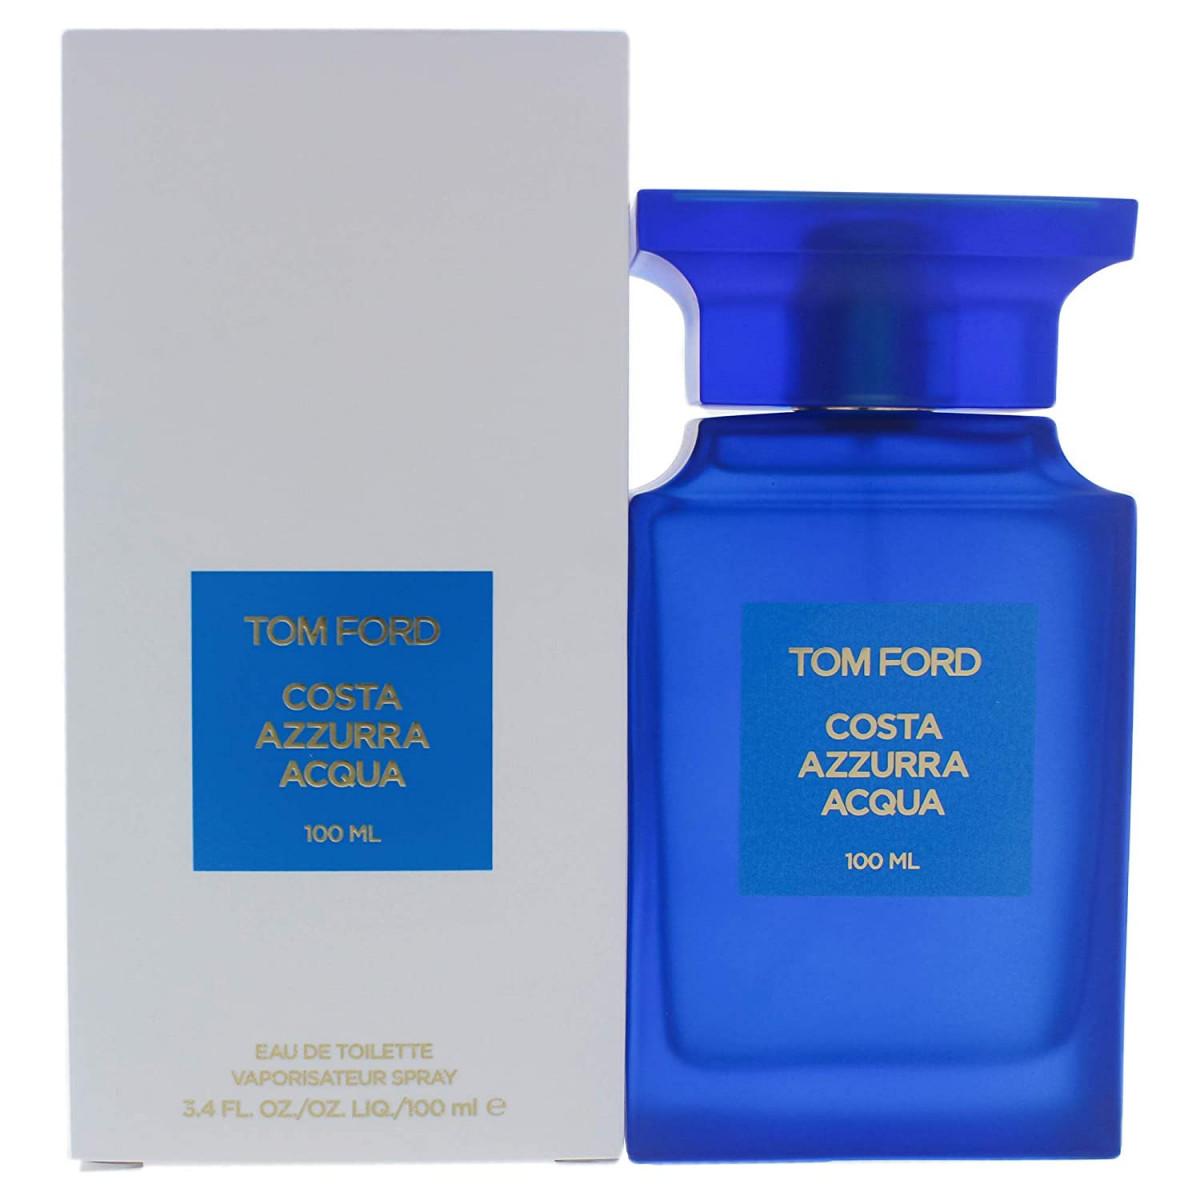 Tom Ford Costa Azzurra Acqua edp 100ml (осіб)